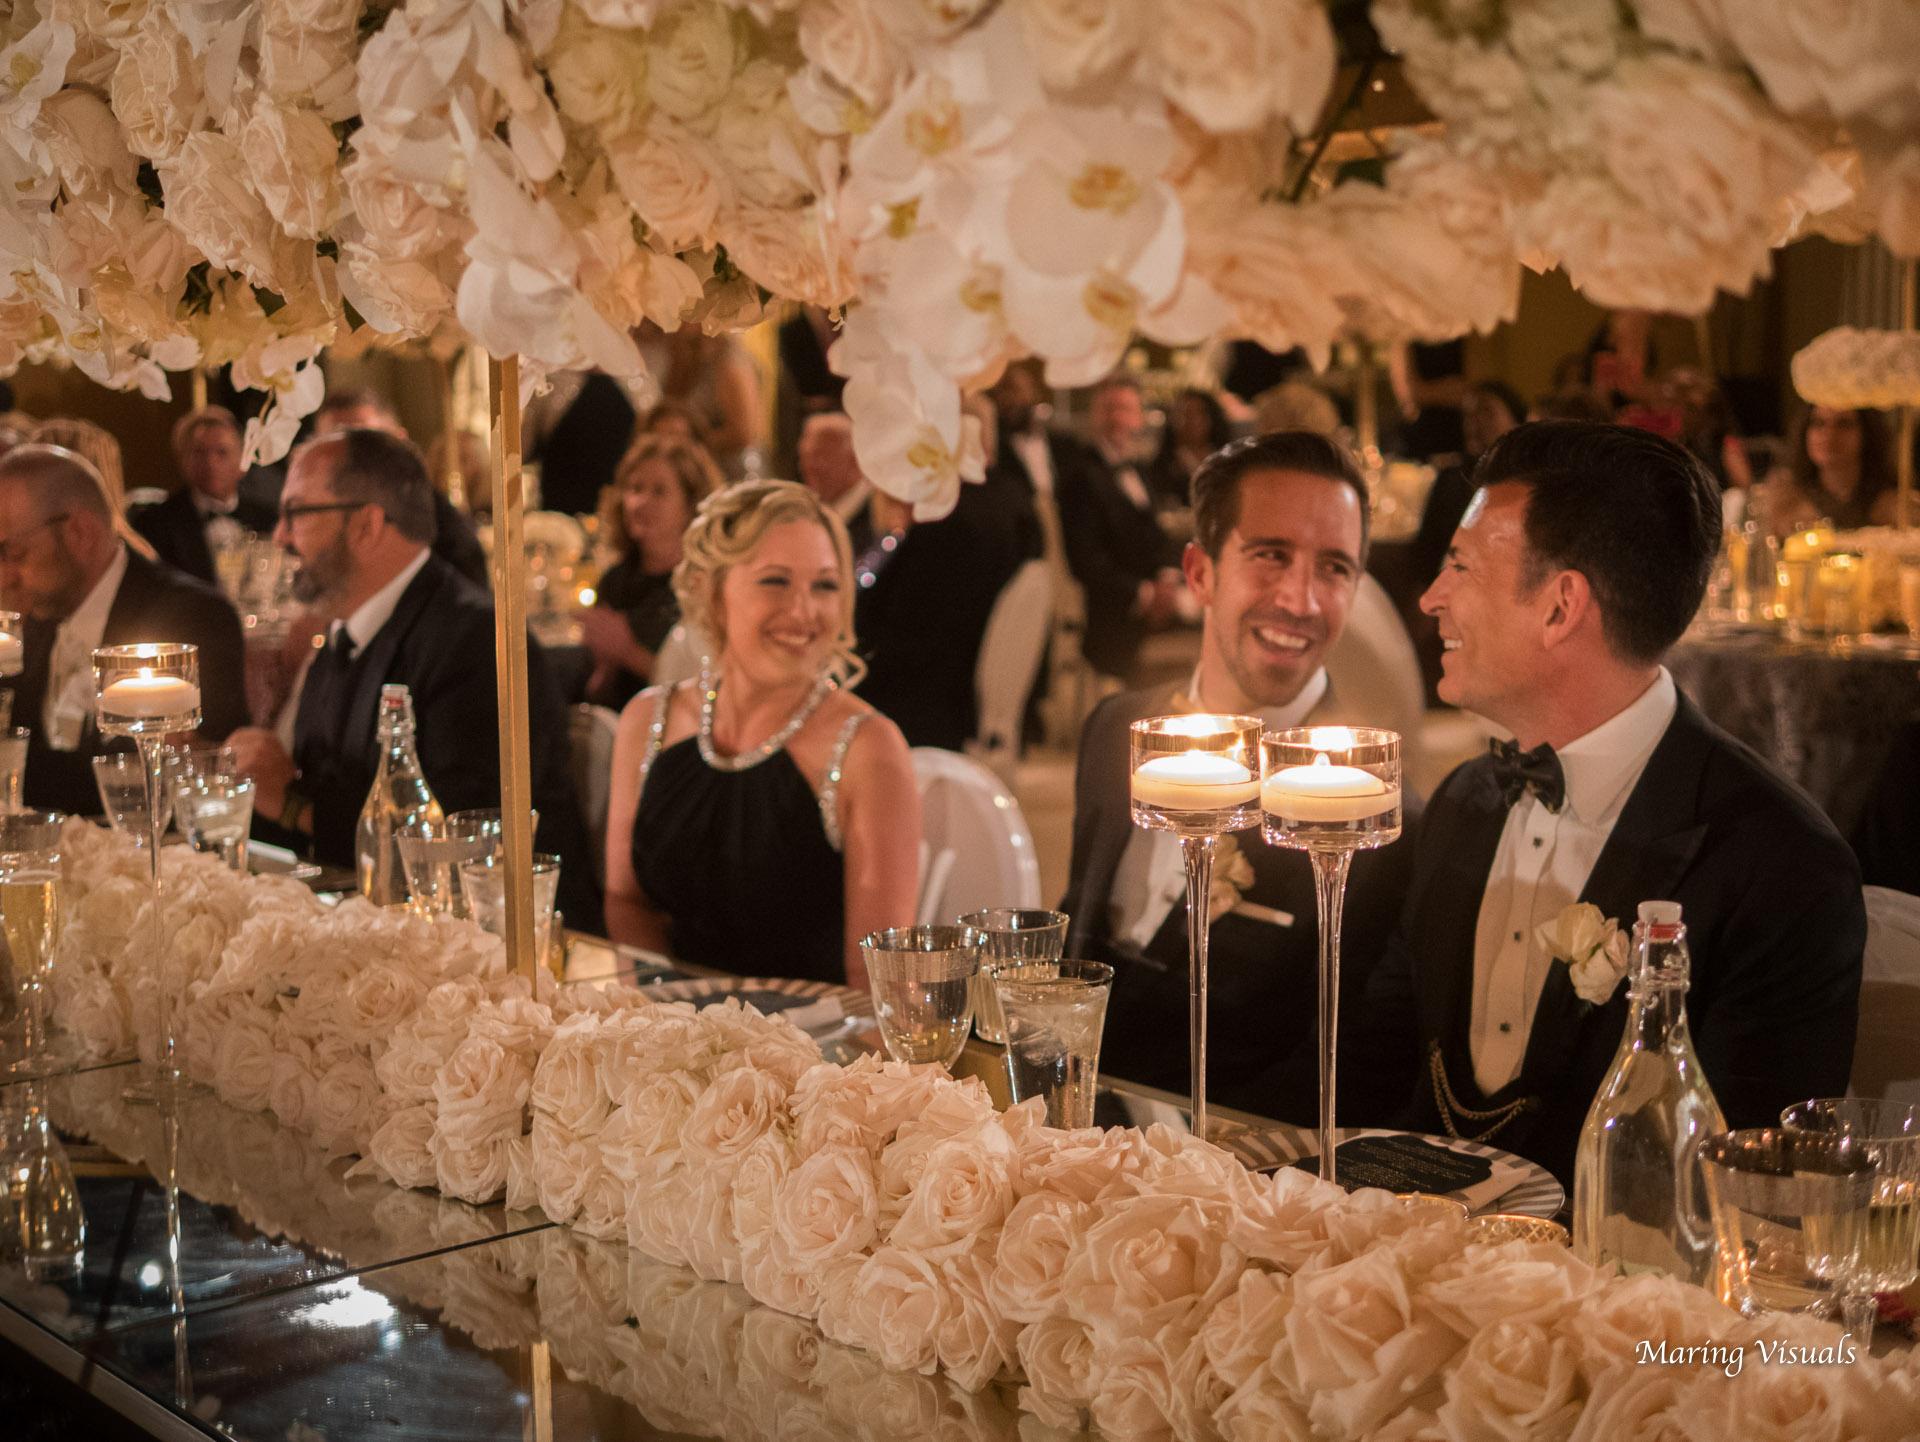 David Tutera Weddings by Maring Visuals 00556.jpg